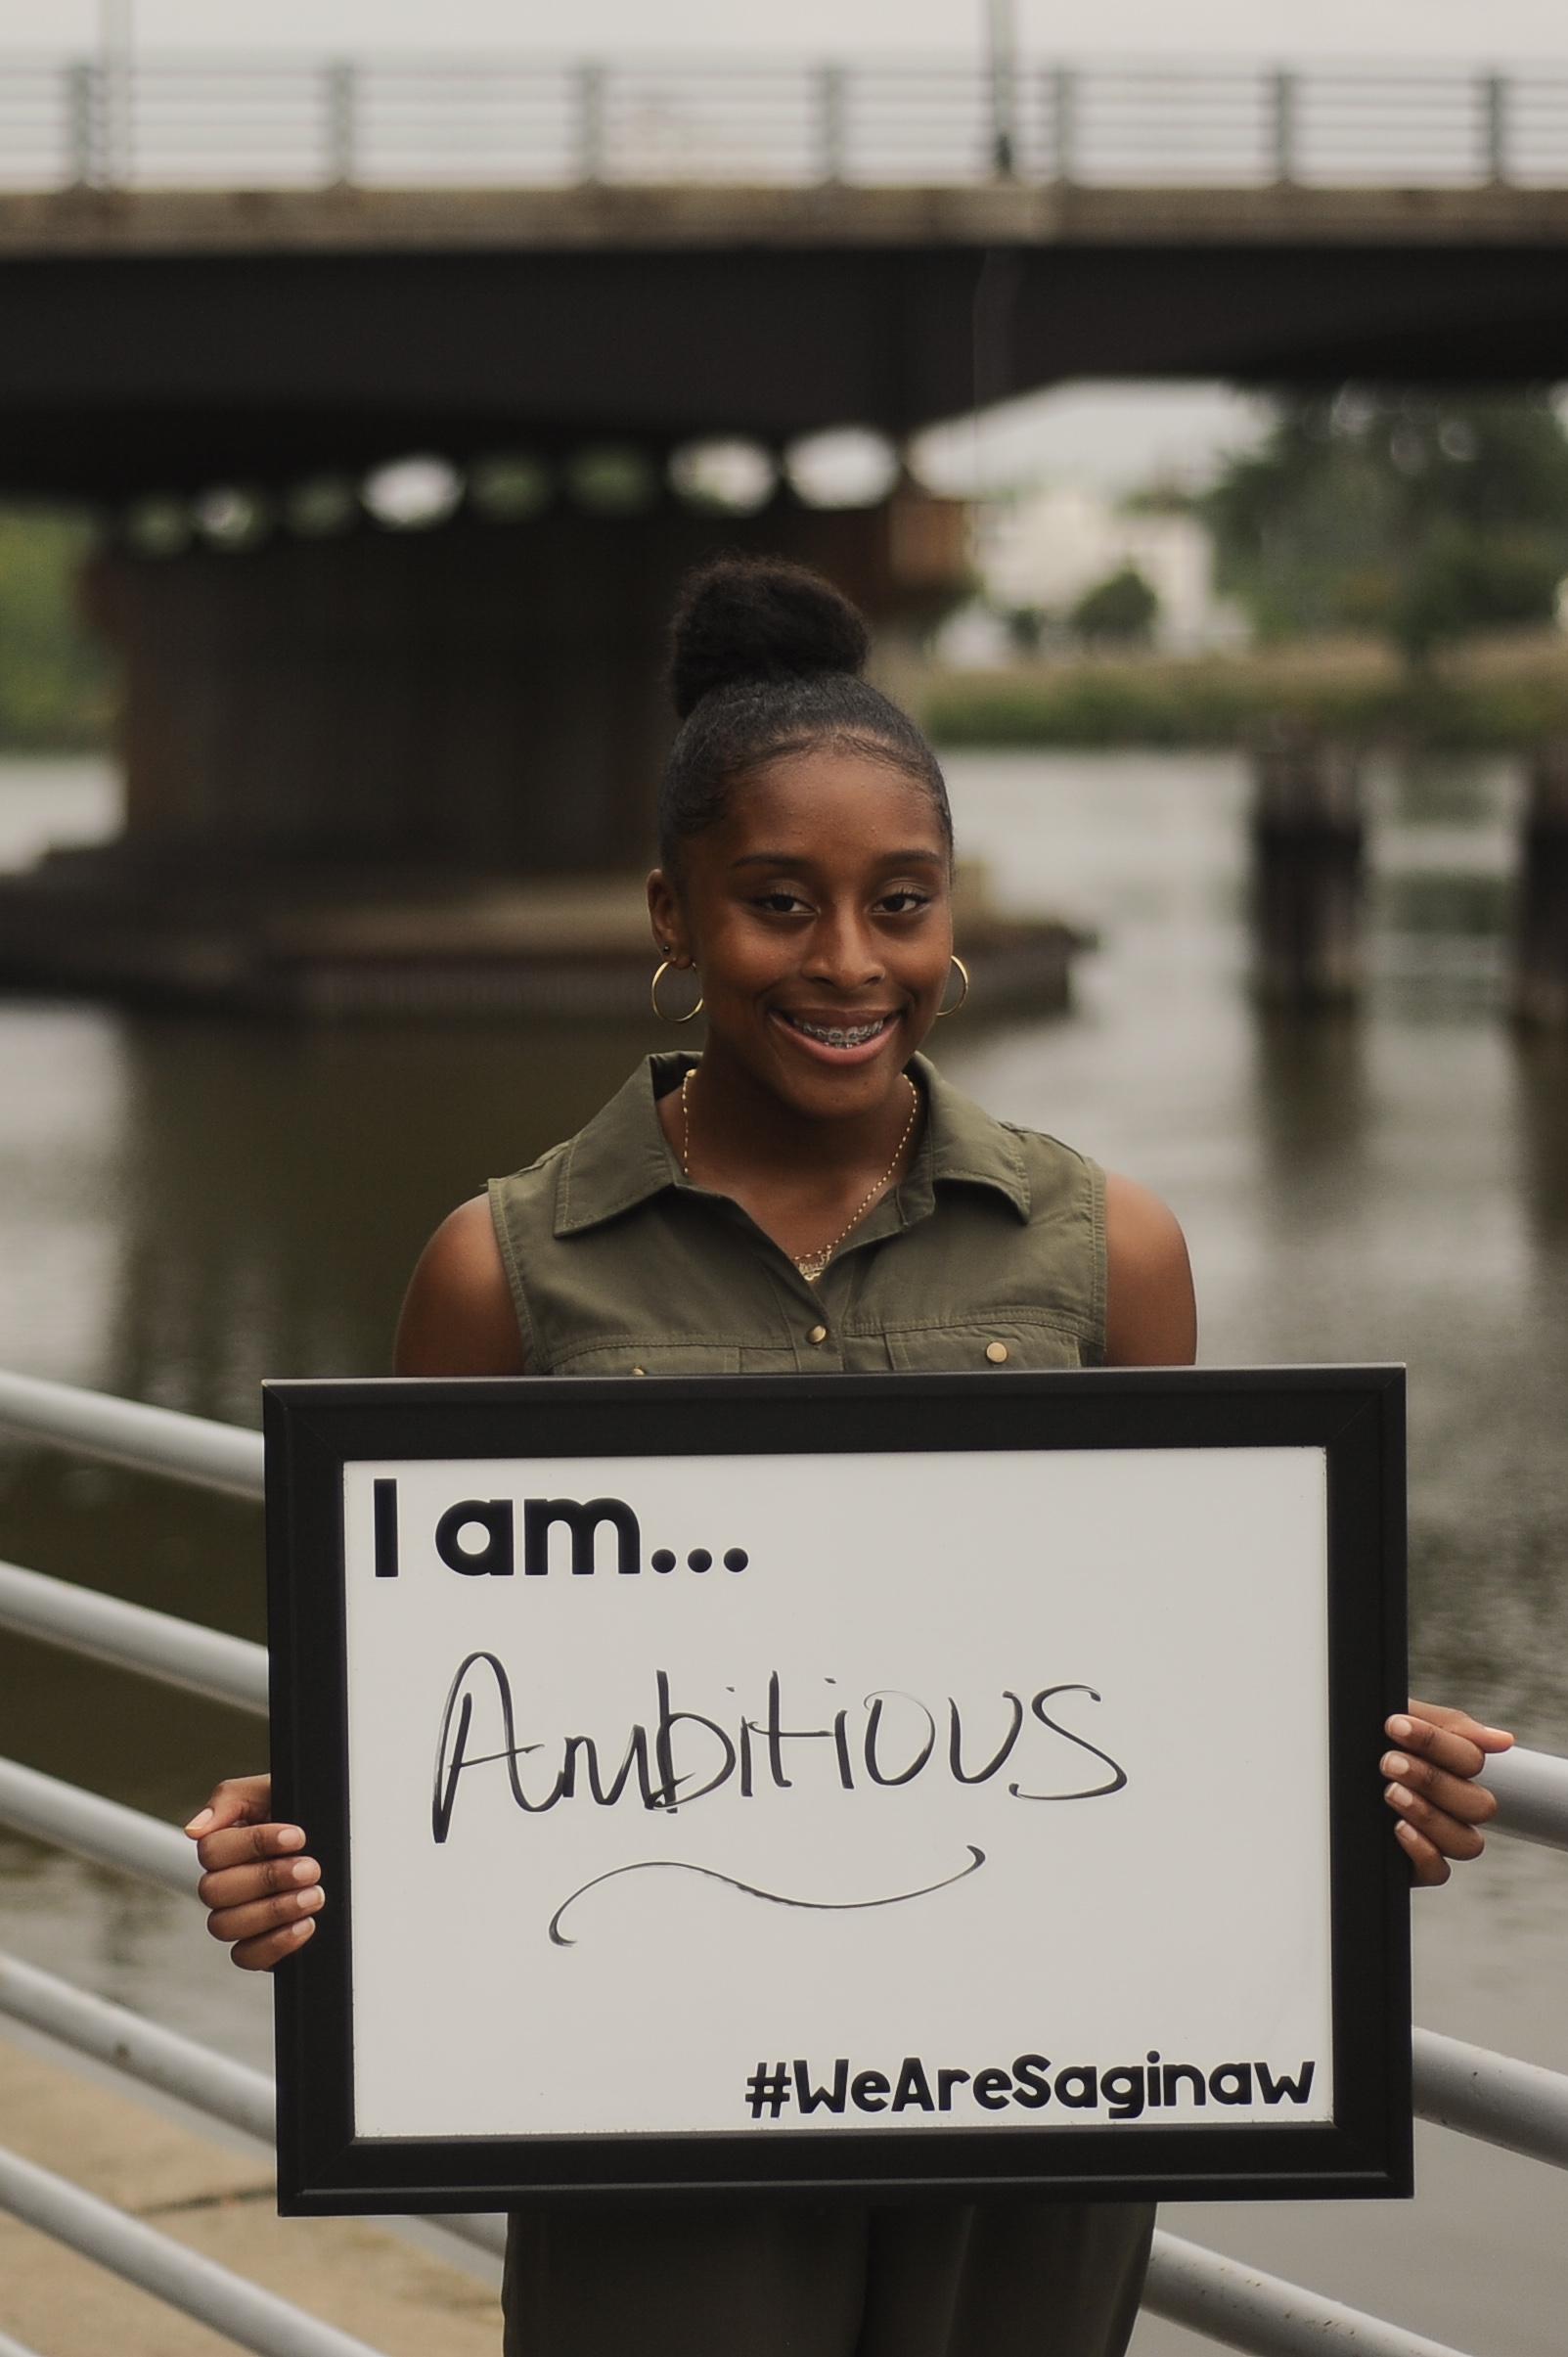 I AM… Ambitious